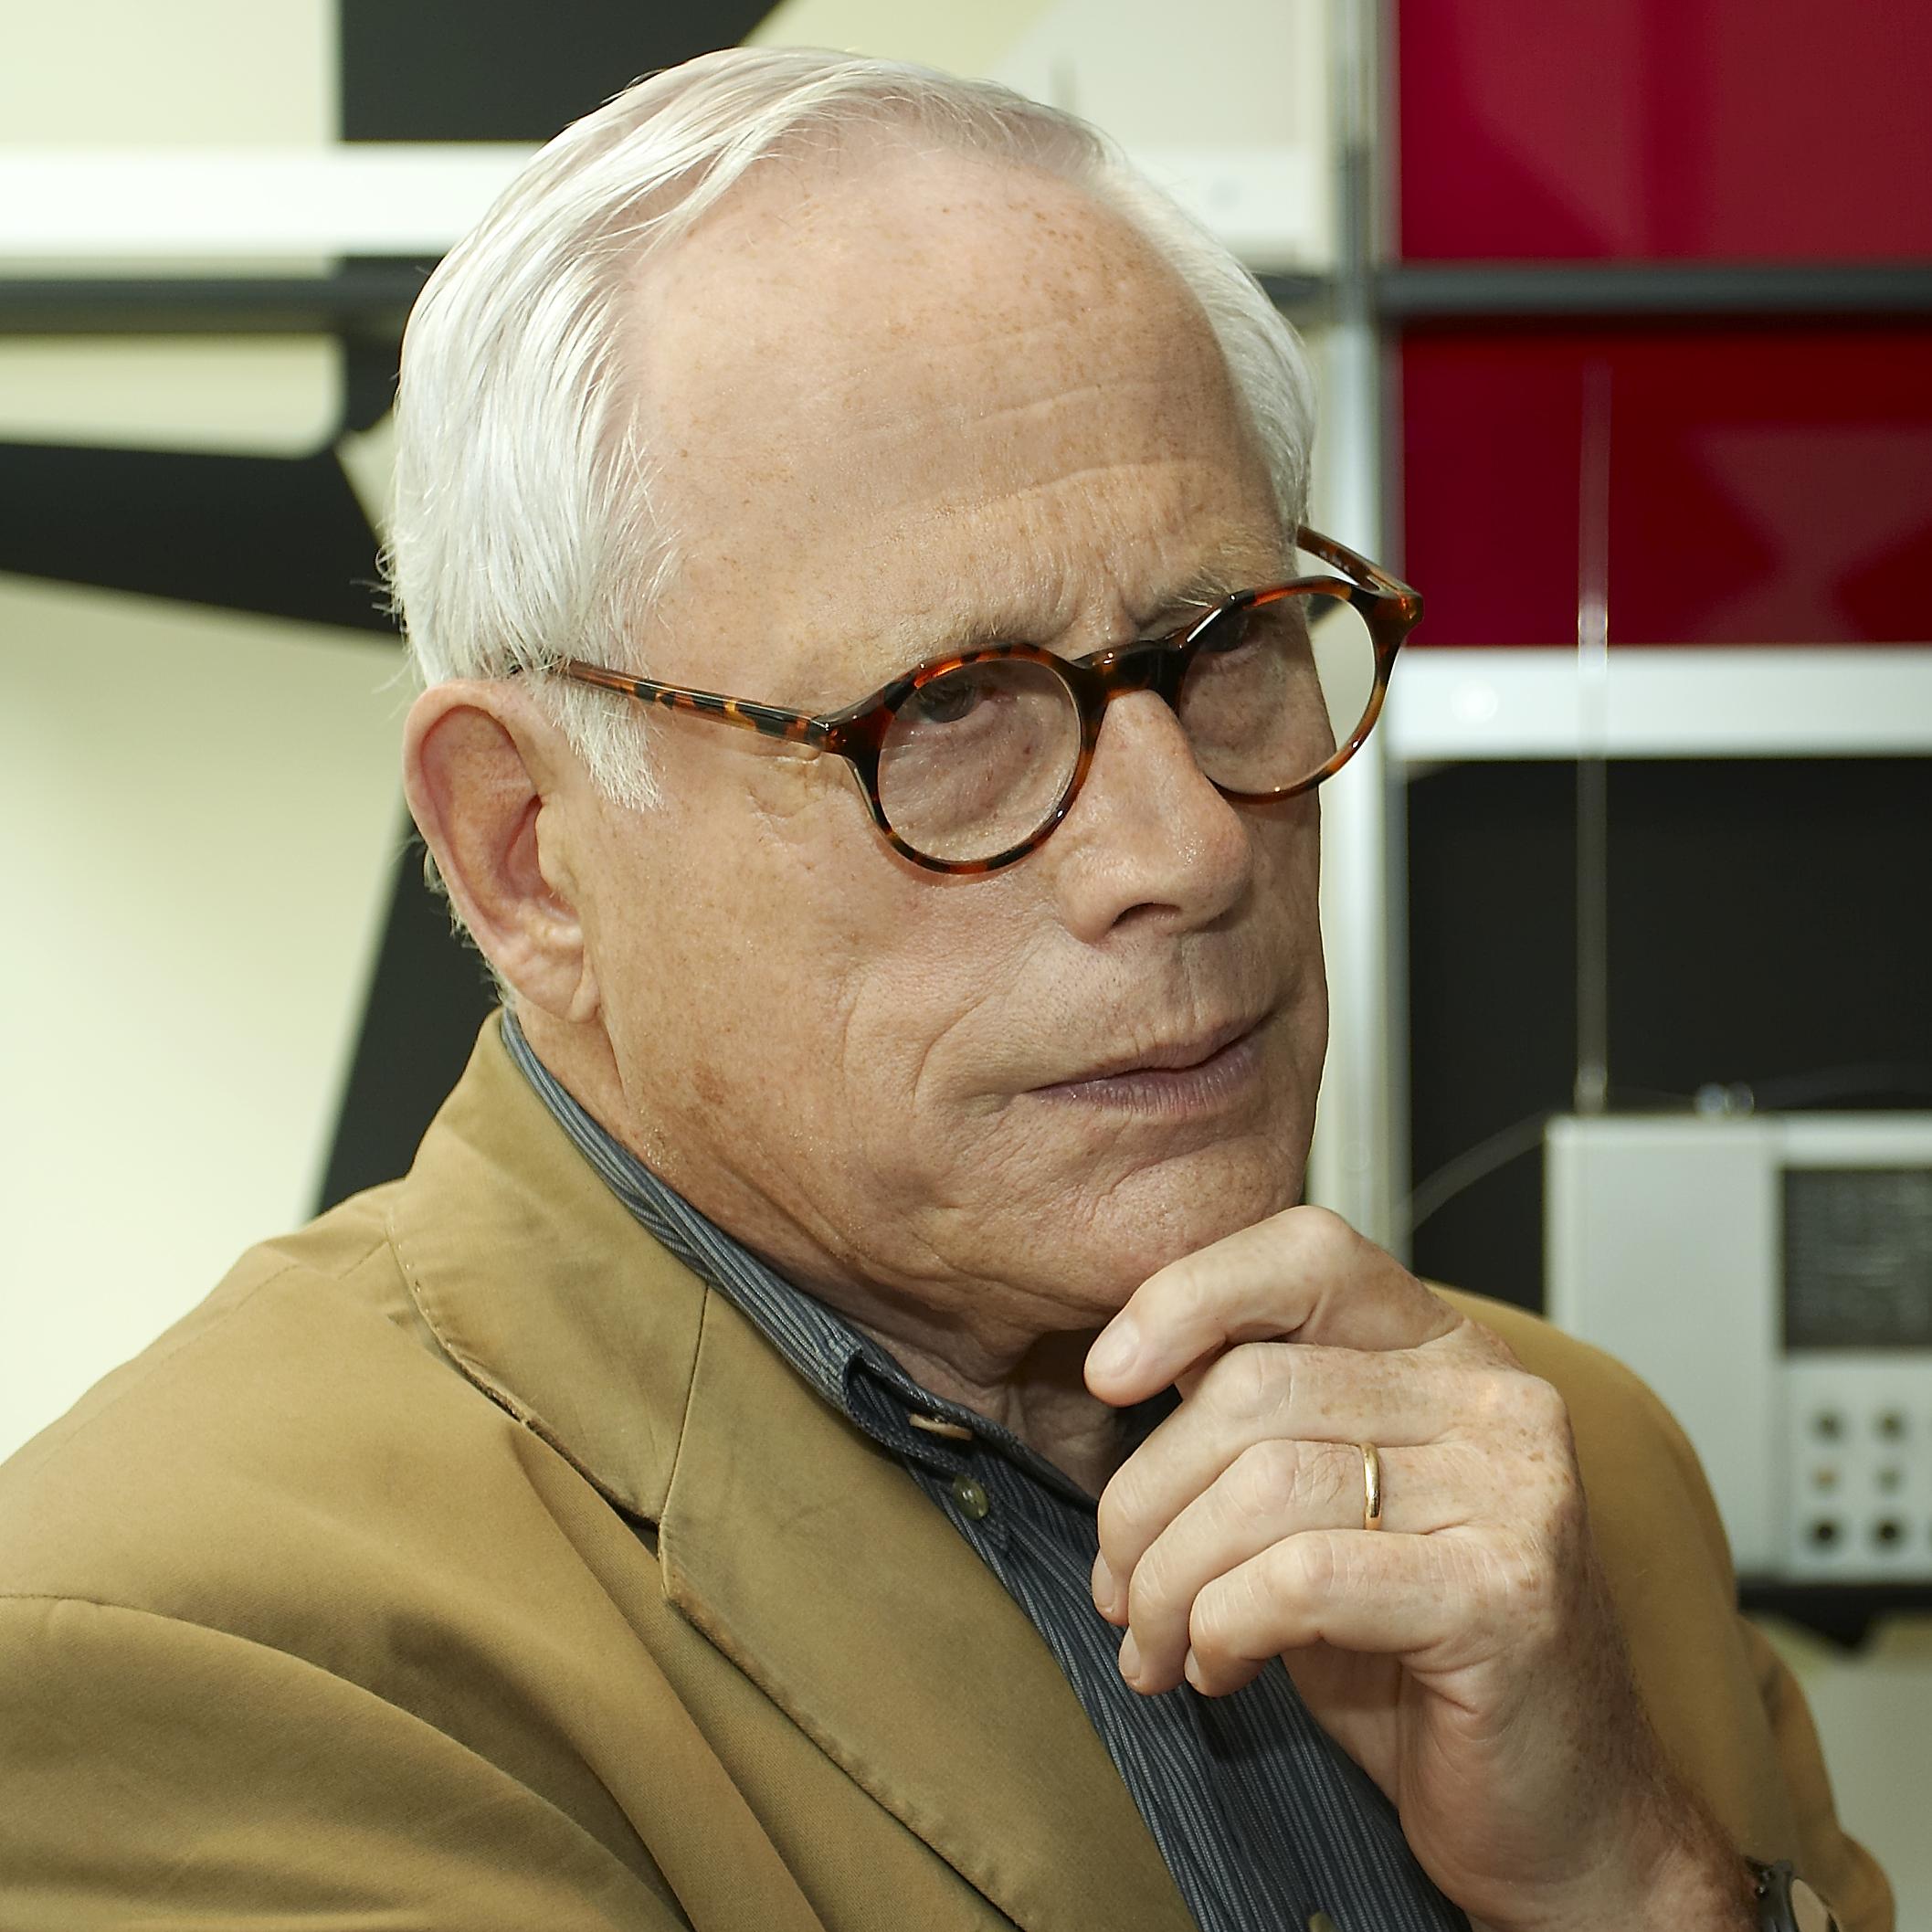 Dieter Rams Portrait